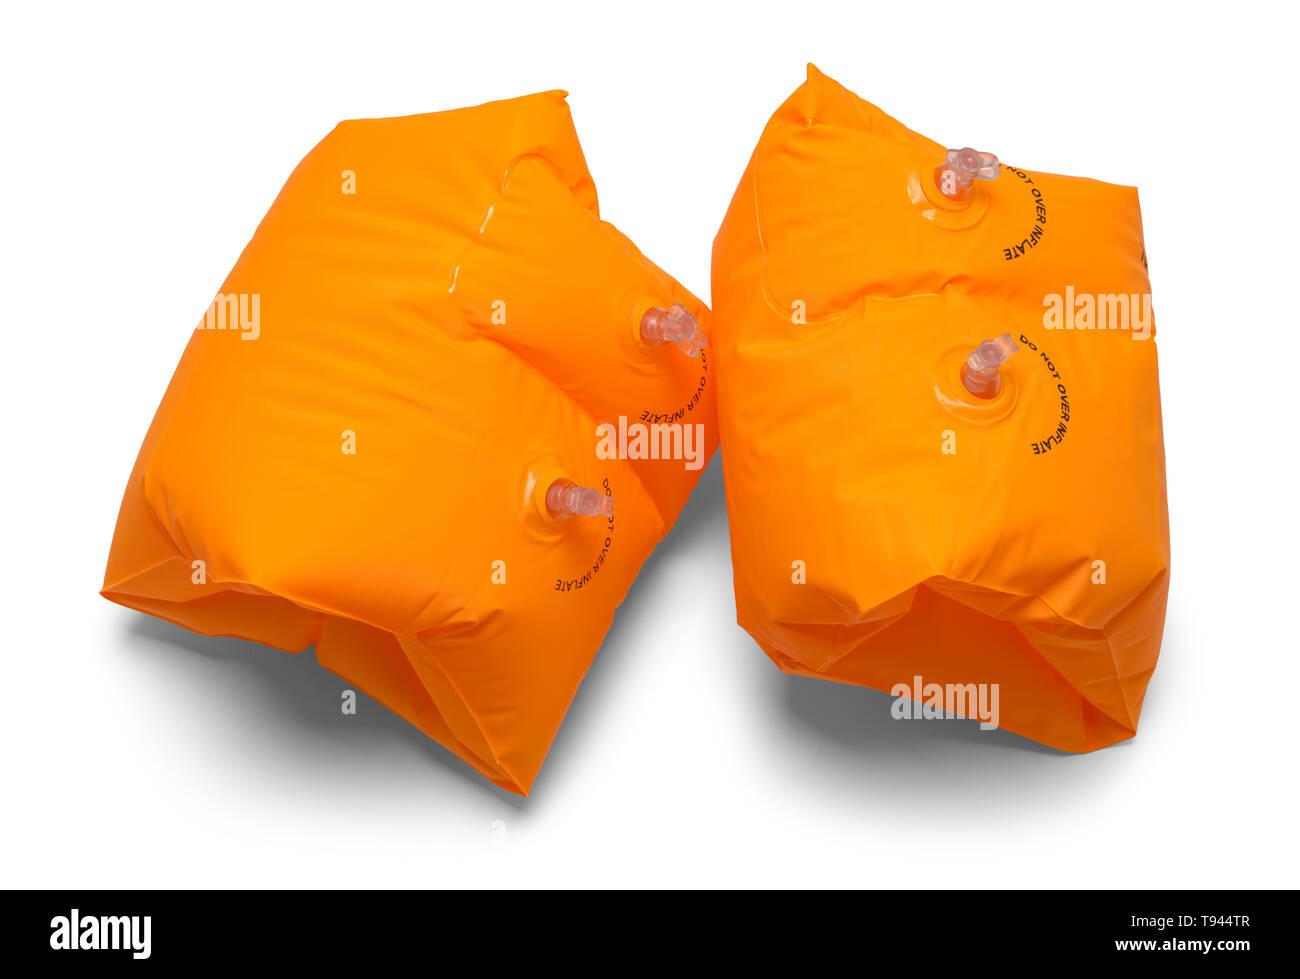 Two Orange Swimming Arm Floats Isolated on White. Stock Photo